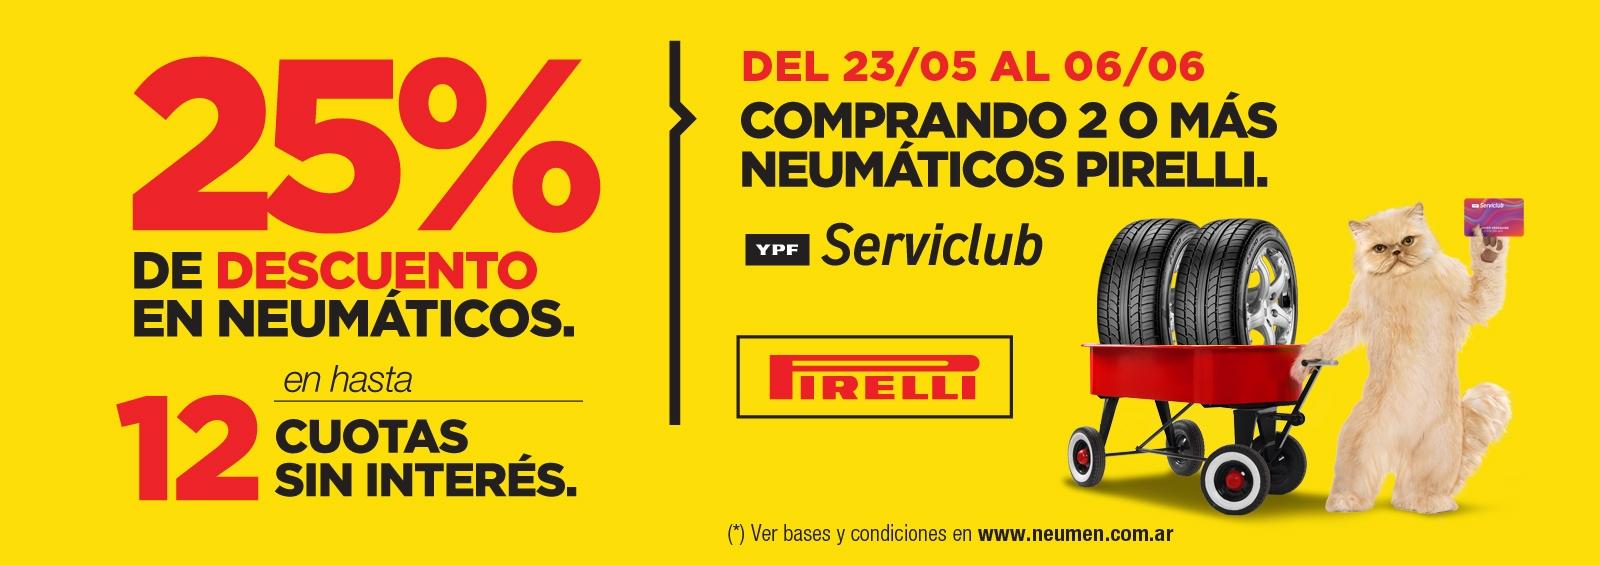 Promo Pirelli - YPF (25%)